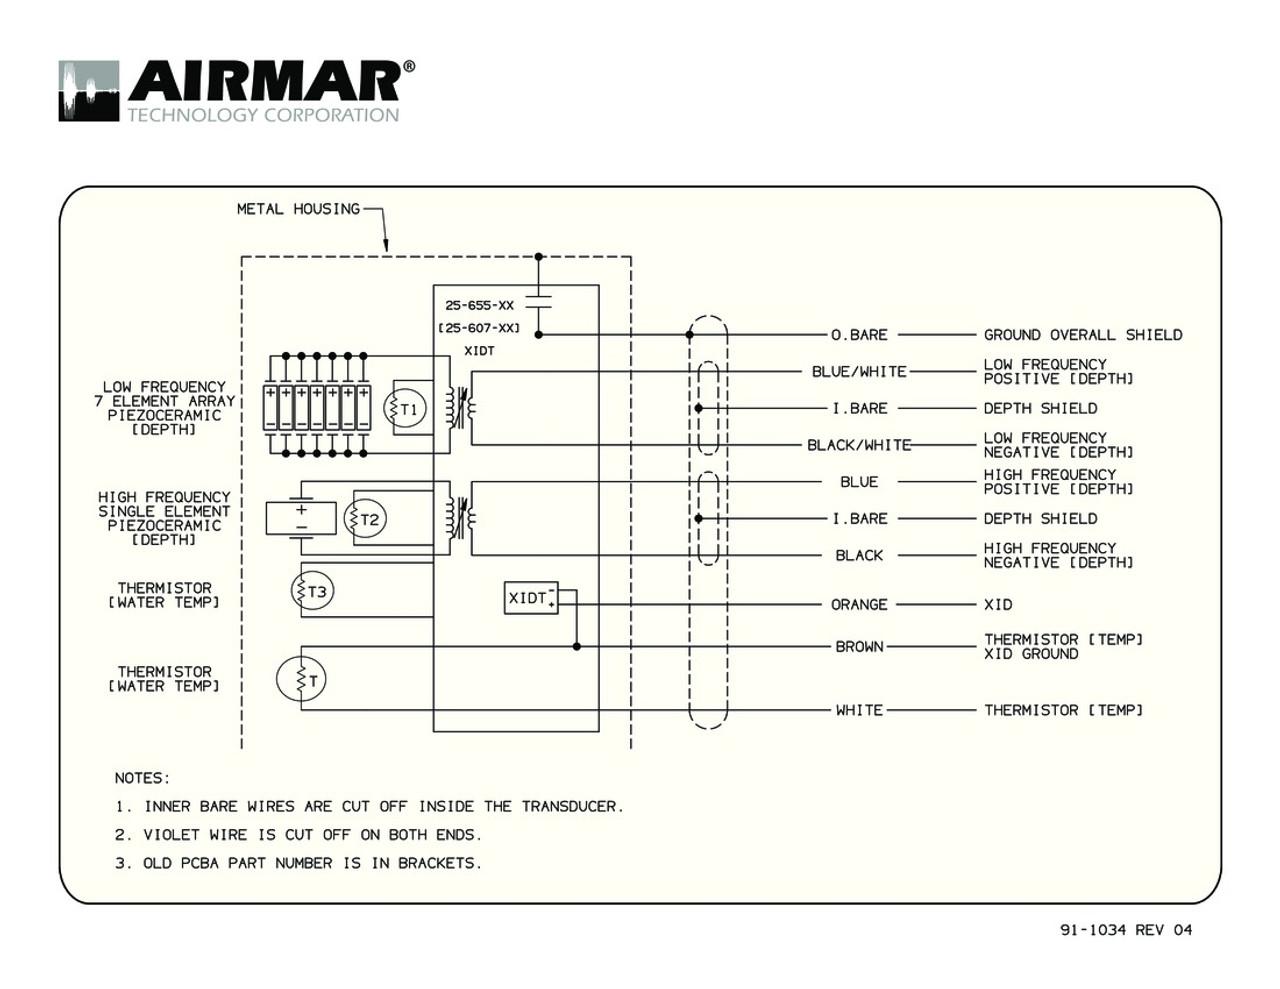 medium resolution of airmar wiring diagram b265 b275 blue bottle marineairmar wiring diagrams 8